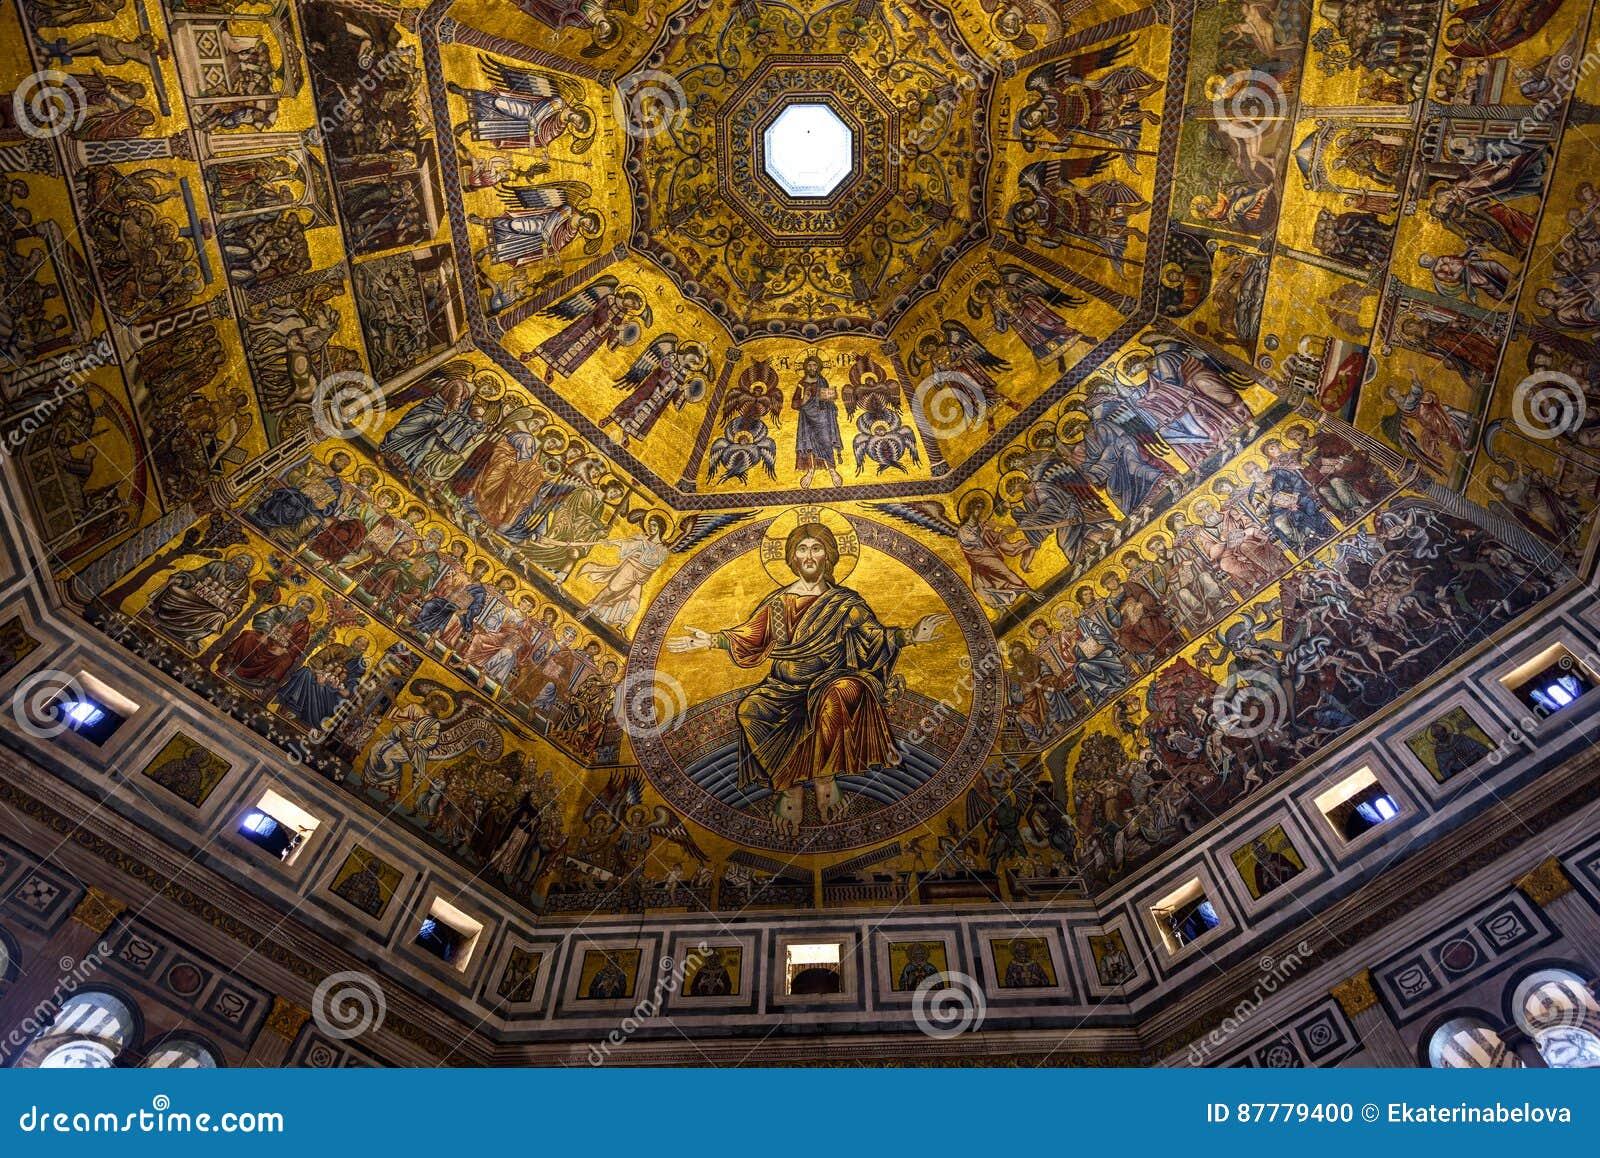 Florence Badkamer Plafond : Mozaïekplafond van florence baptistery van san giovanni battistero